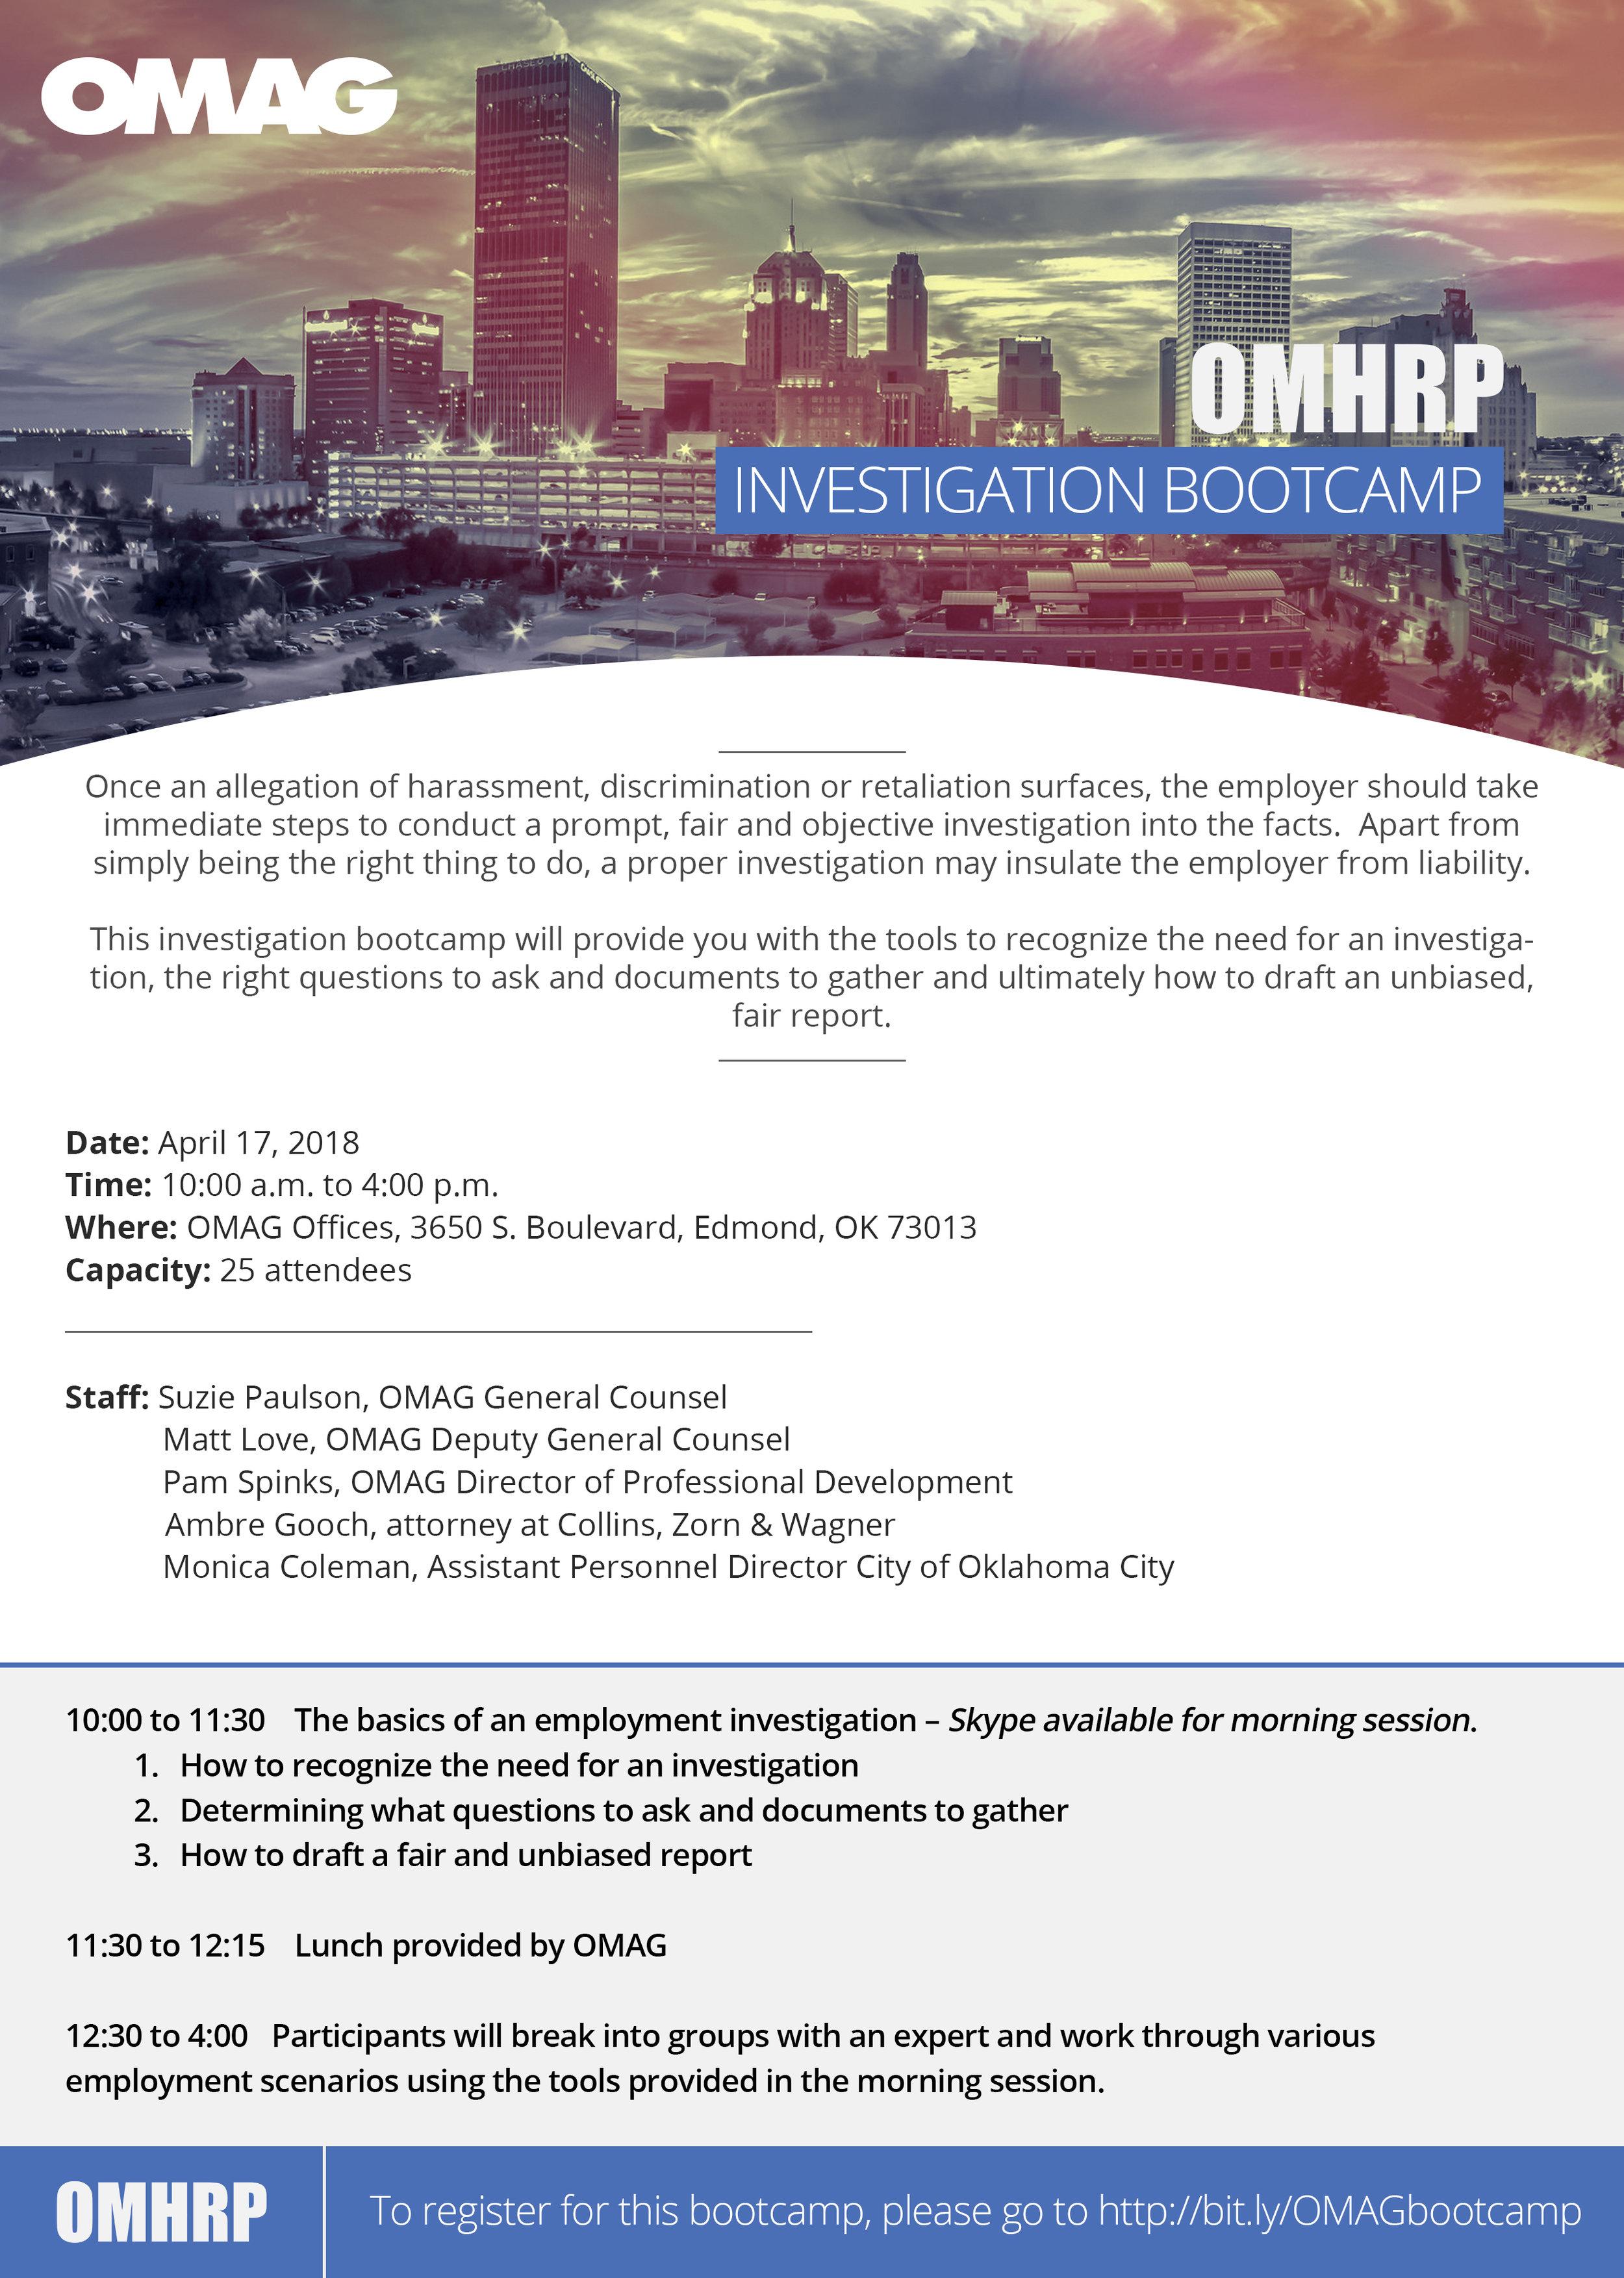 OMHRP Bootcamp Flyer.jpg